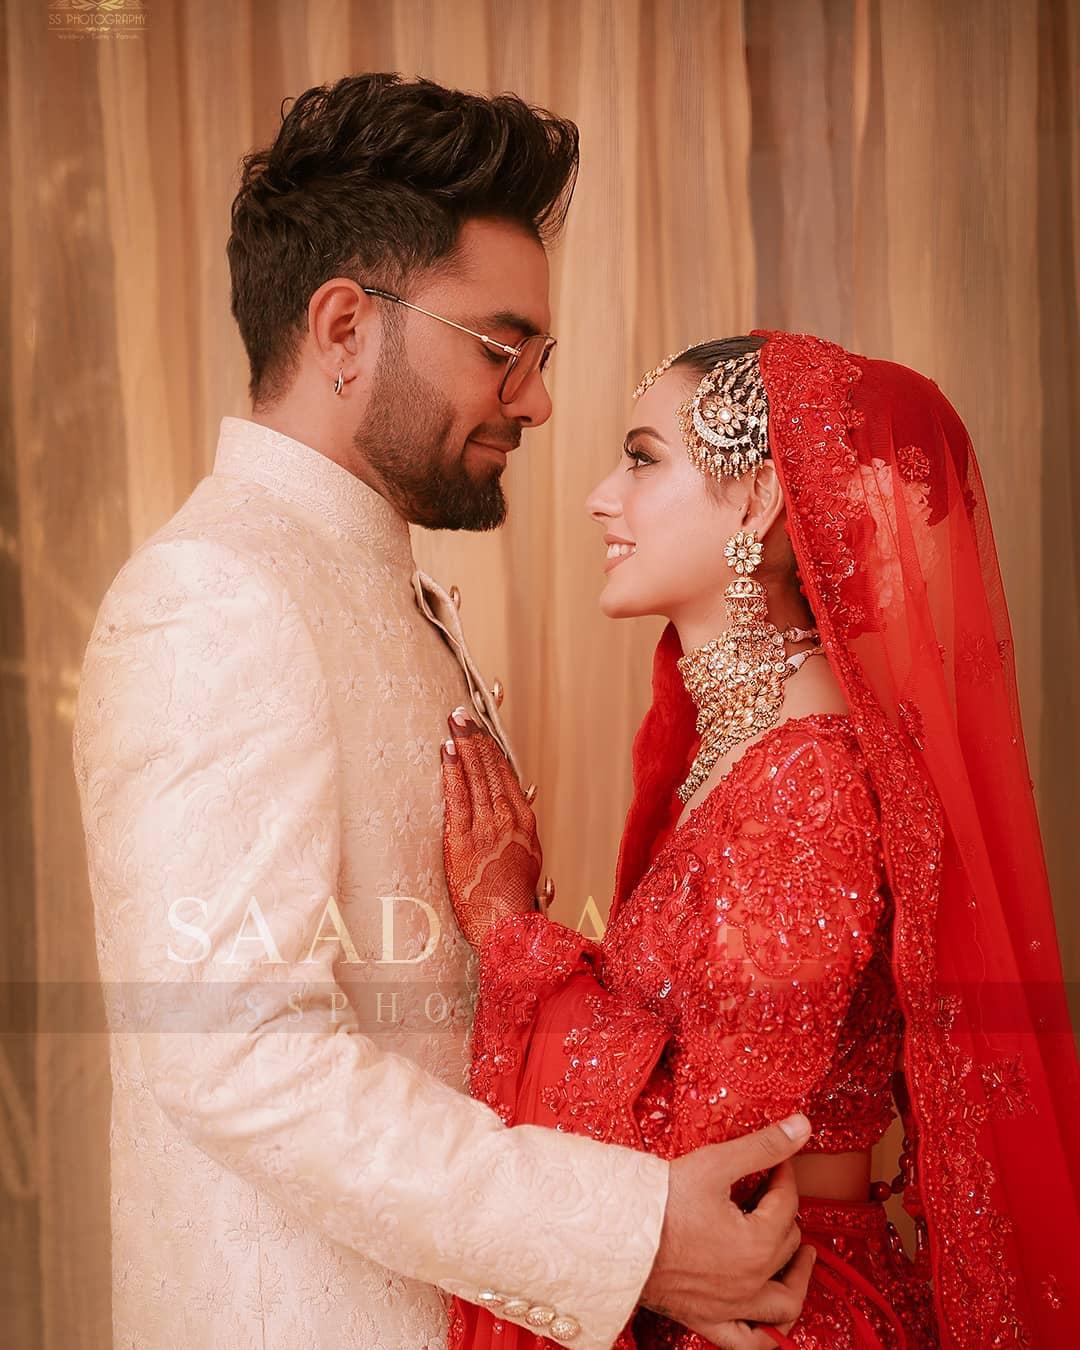 Iqra Aziz and Yasir Hussain Wedding Pictures (27)